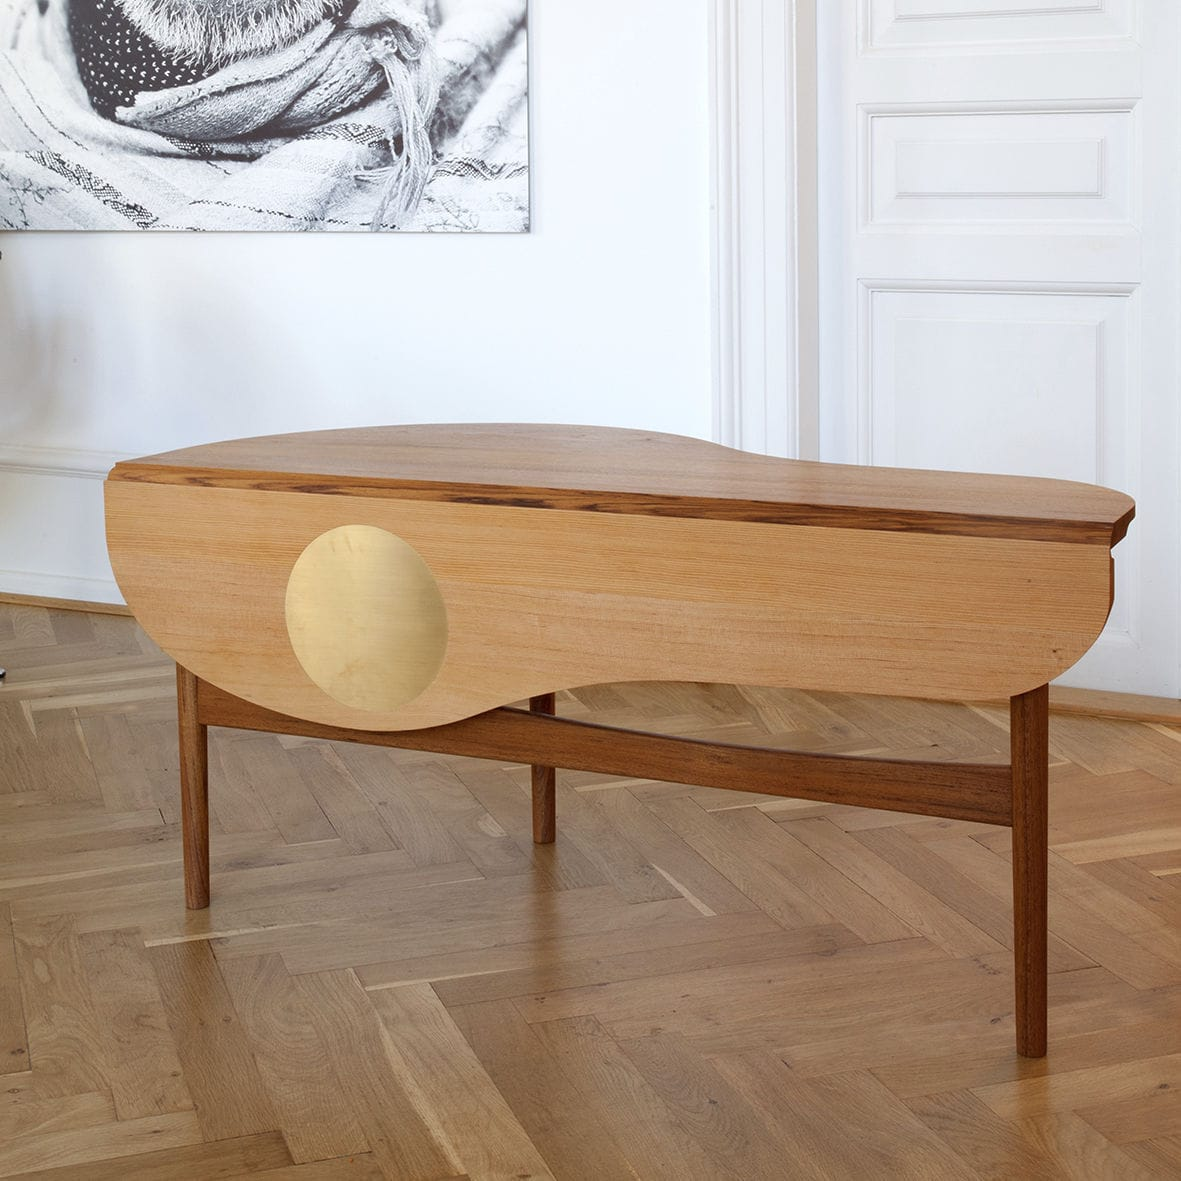 Couchtisch / Skandinavisches Design / Aus Teakholz / Aus Kiefer / Messing    BUTTERFLY